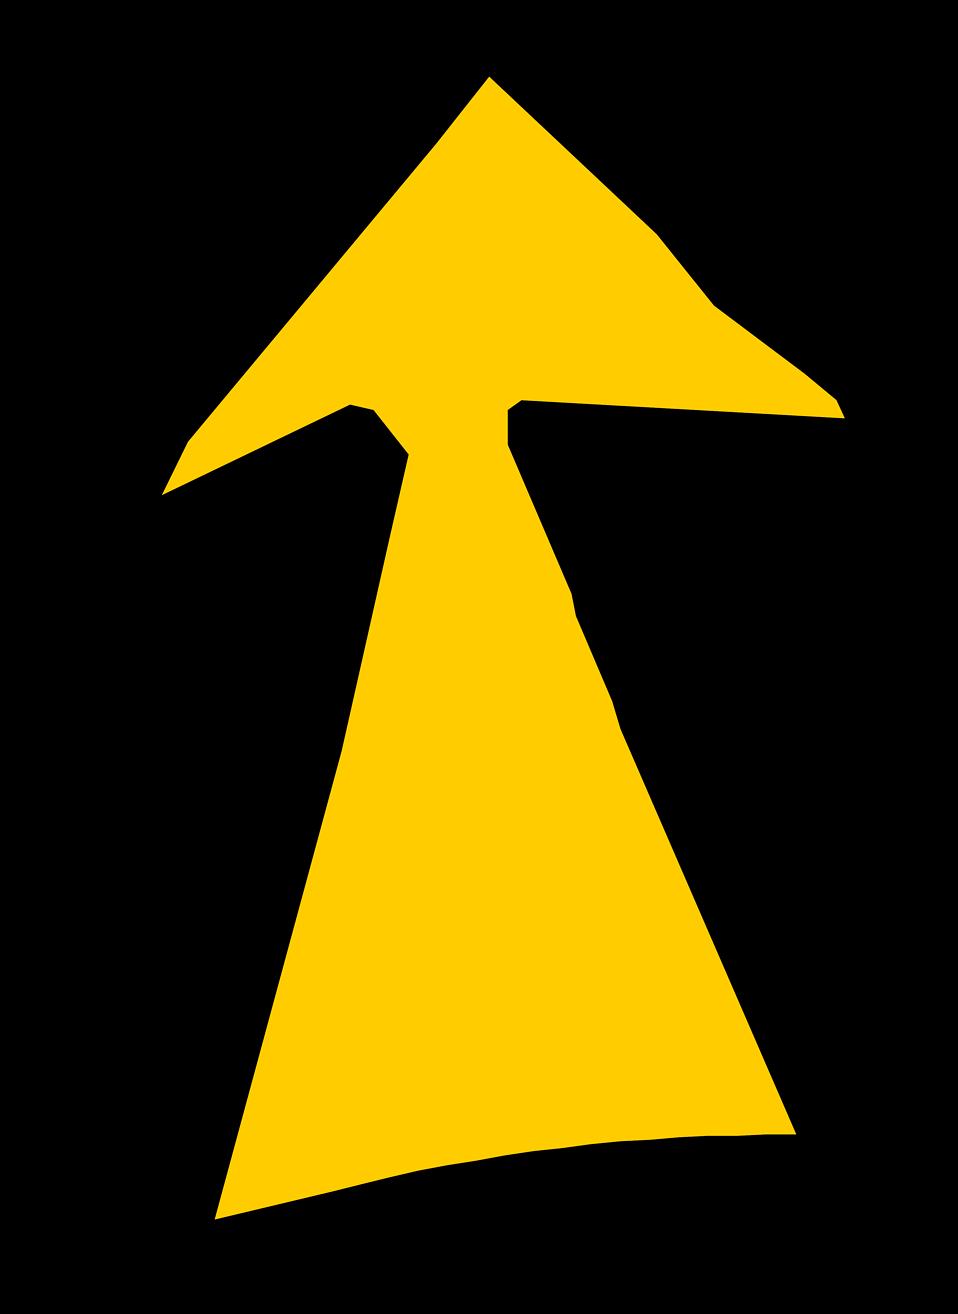 Arrow Yellow | Free Stock Photo | Illustration of a yellow ...